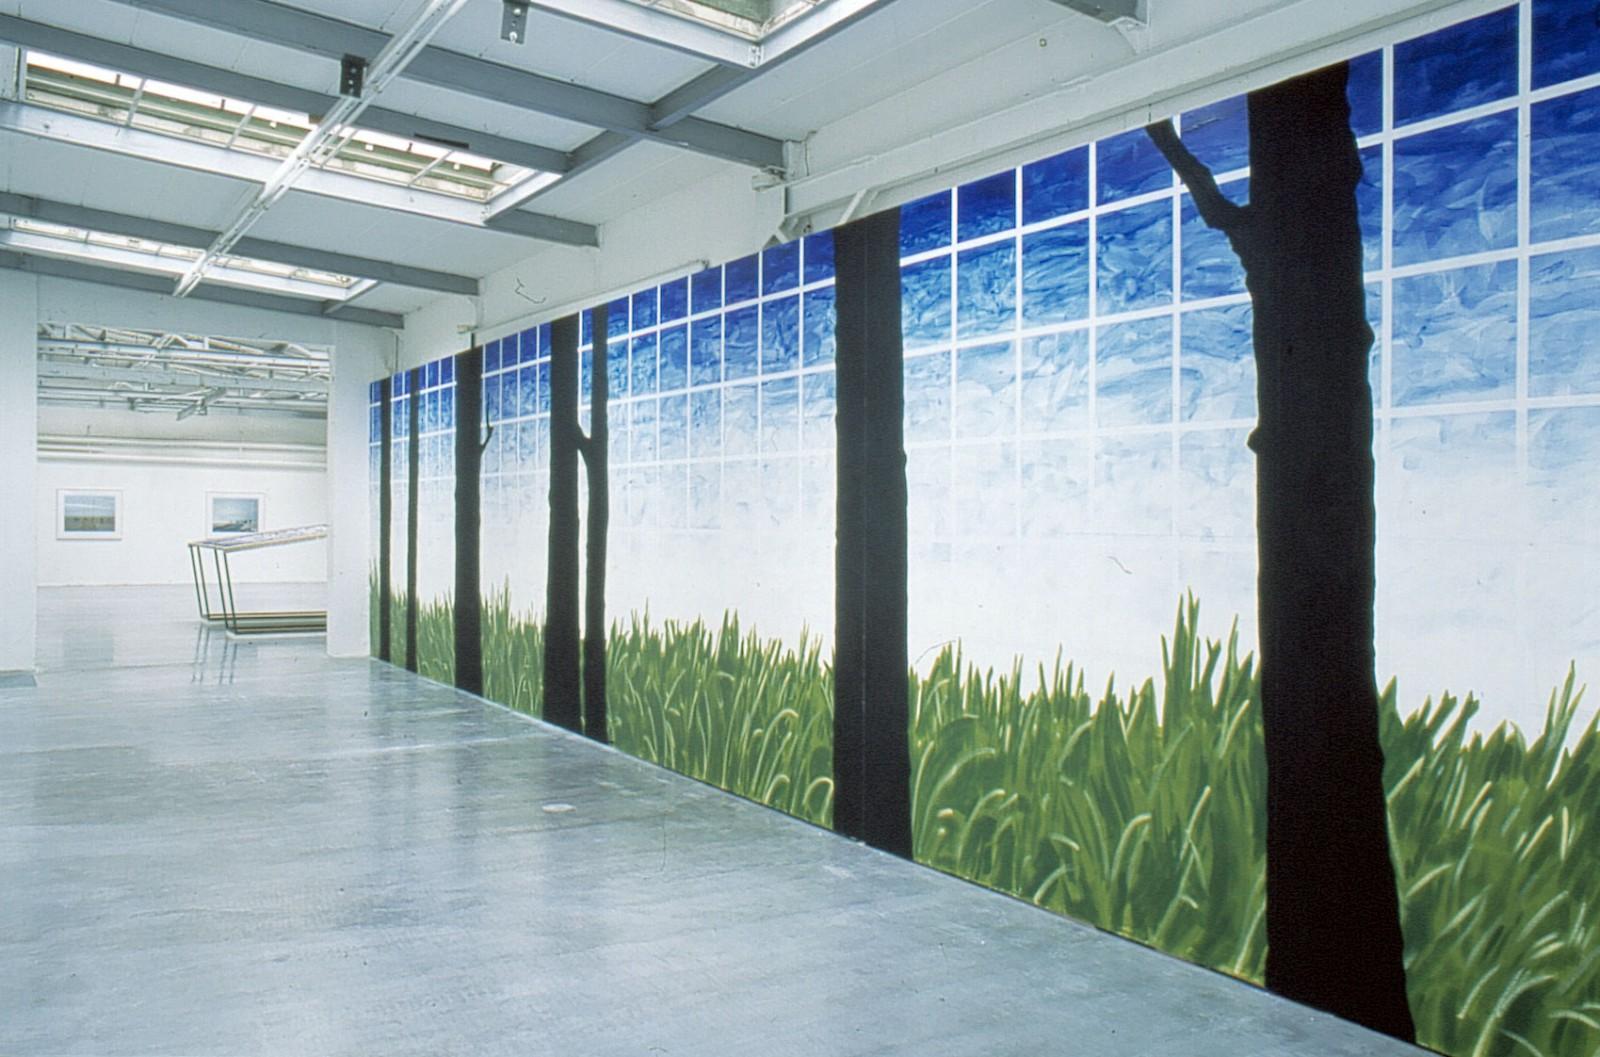 Kim Nekarda: I am the Island, 2002, Wall Painting, event horizon, Lothringer 13/Halle, München, 300 x 1470 cm